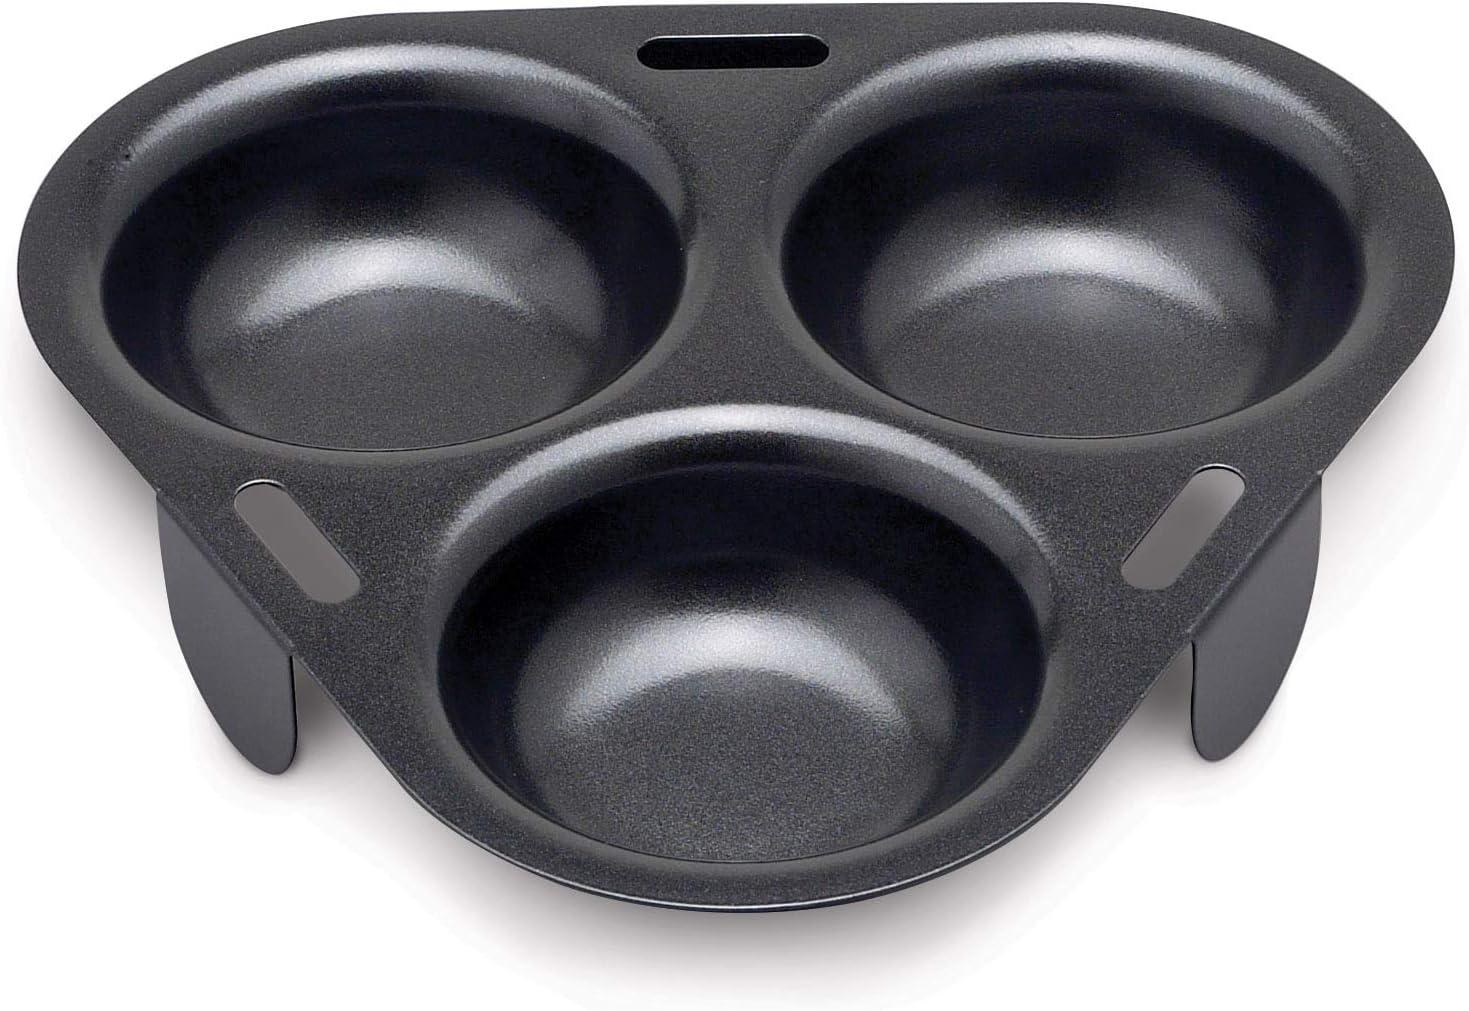 HIC Non-Stick 3-Egg Poacher Insert, PFOA and BPA Free